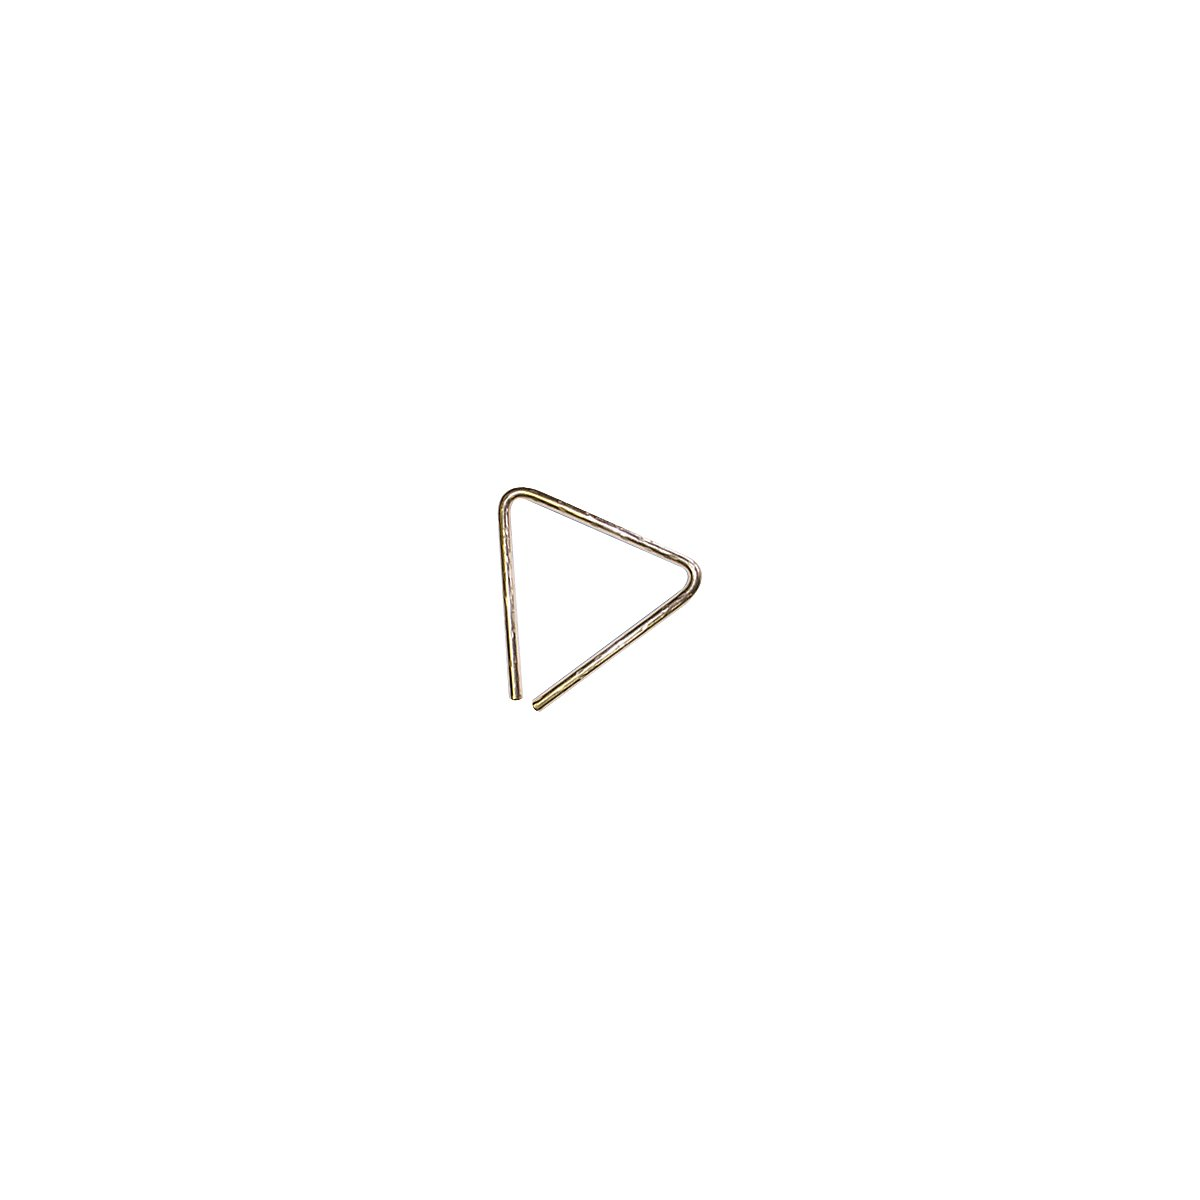 Sabian Triangles 61135-5B8H 5-Inch Hand Hammered B8 Bronze Triangle